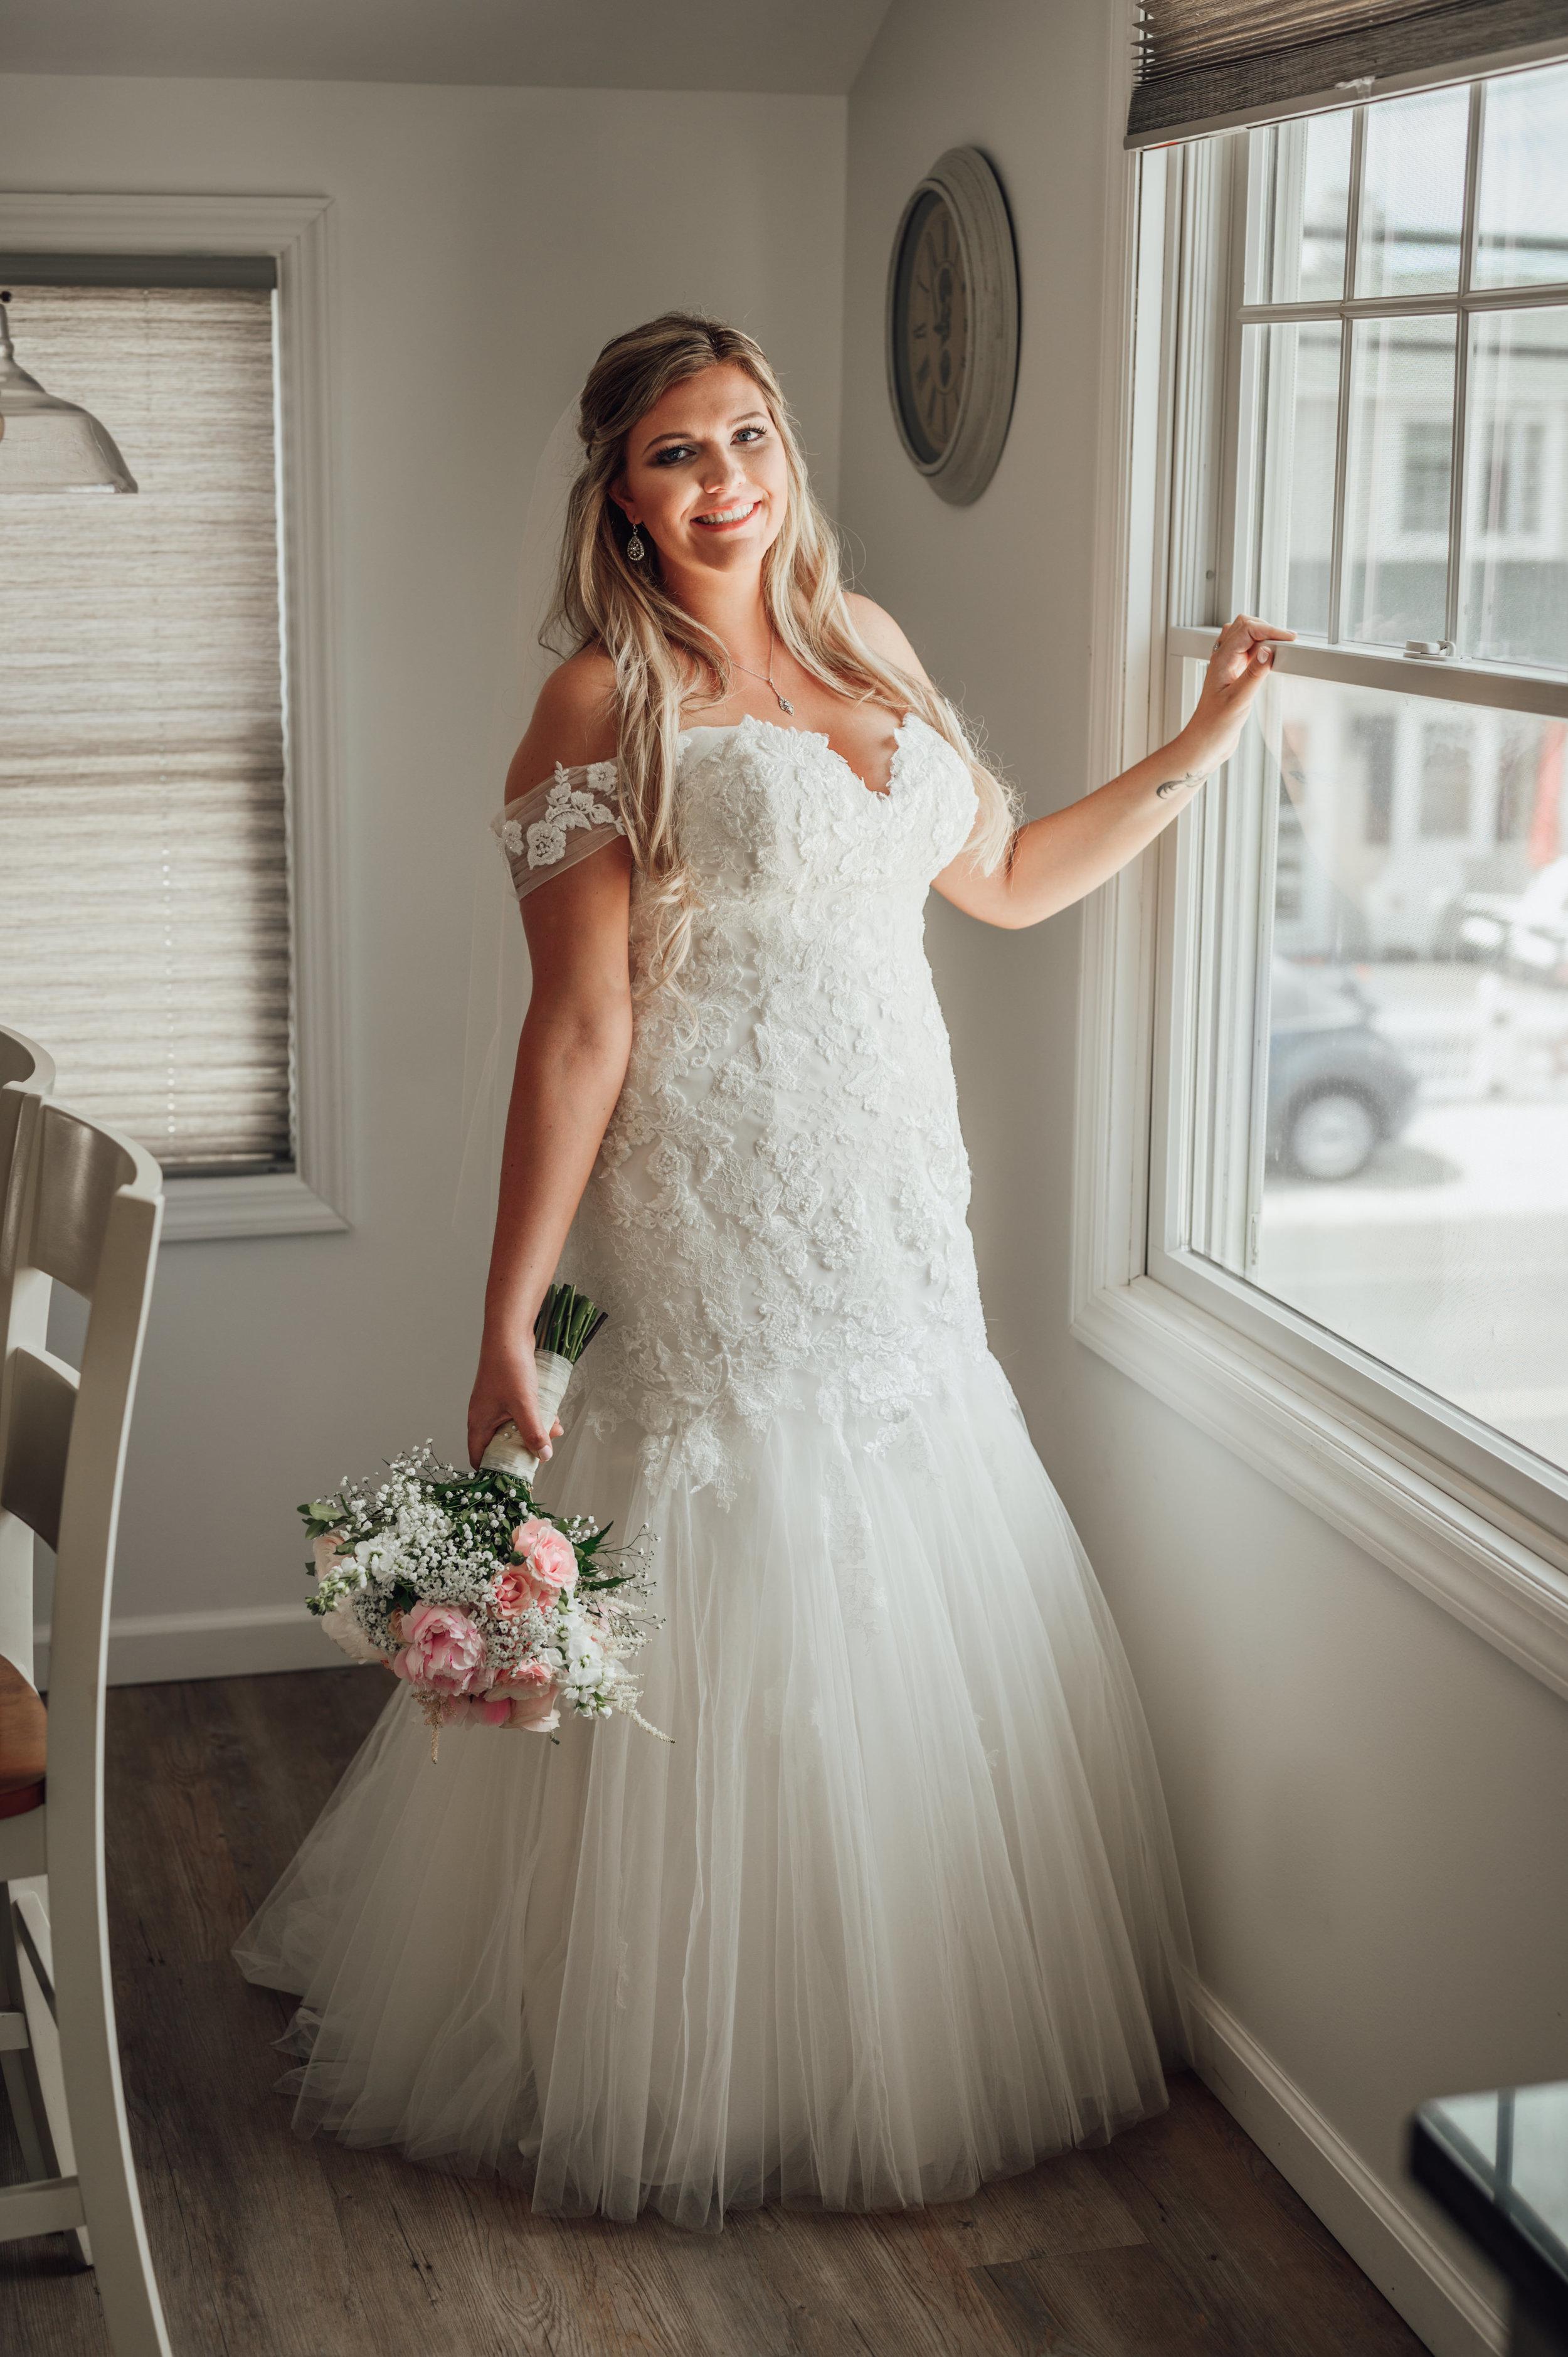 New Jersey Wedding Photographer, Felsberg Photography LBI wedding photography 37.jpg